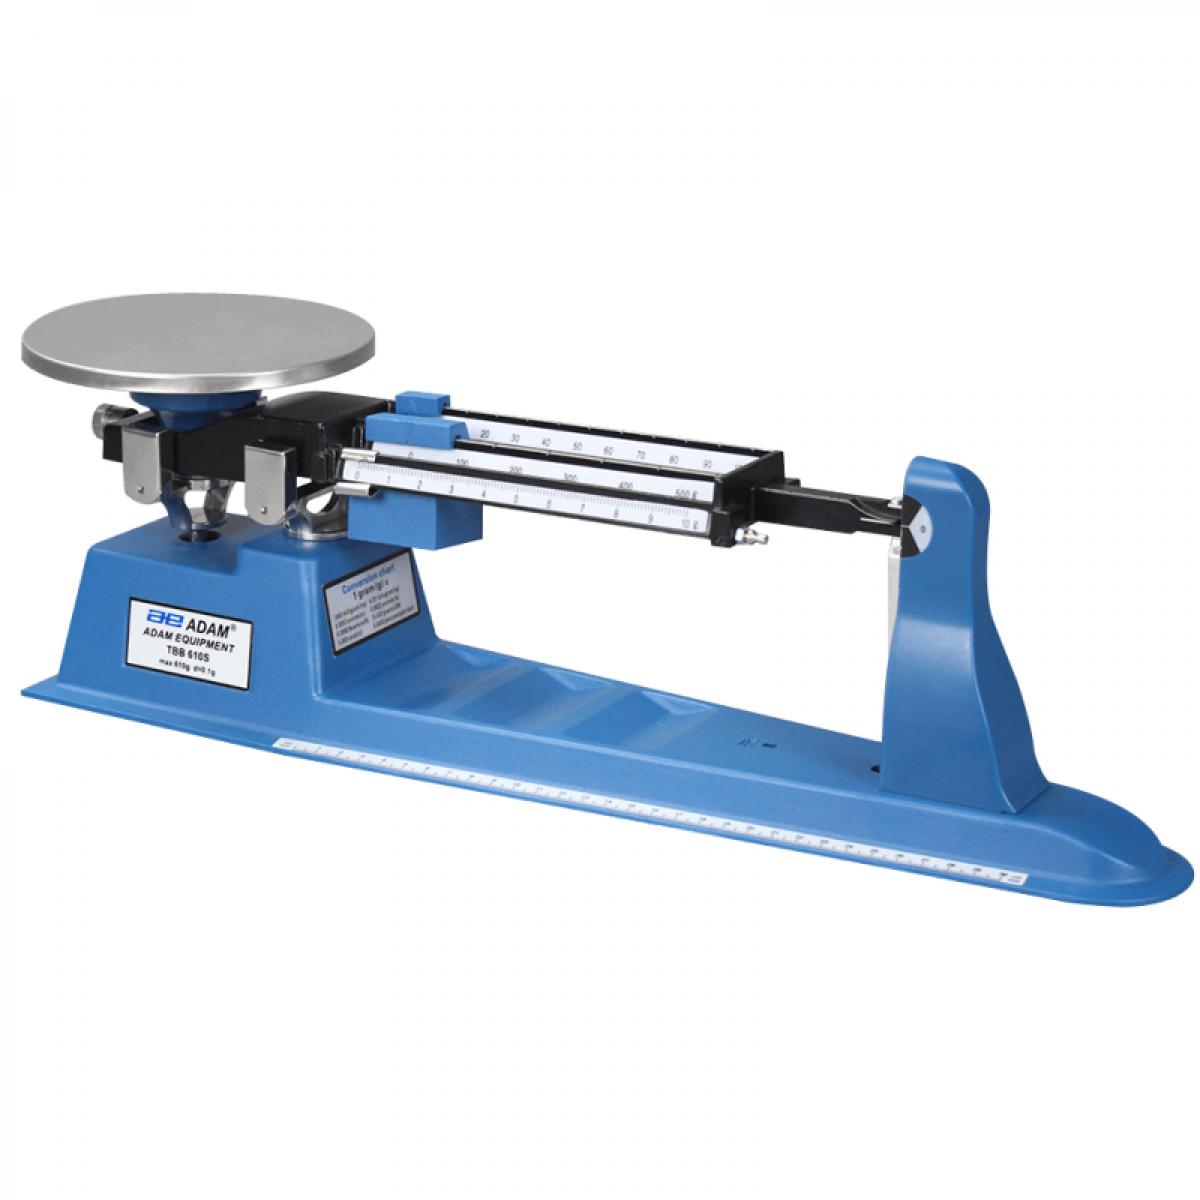 Triple Beam Balance - Mechanical - Balances  for laboratory triple beam balance  584dqh